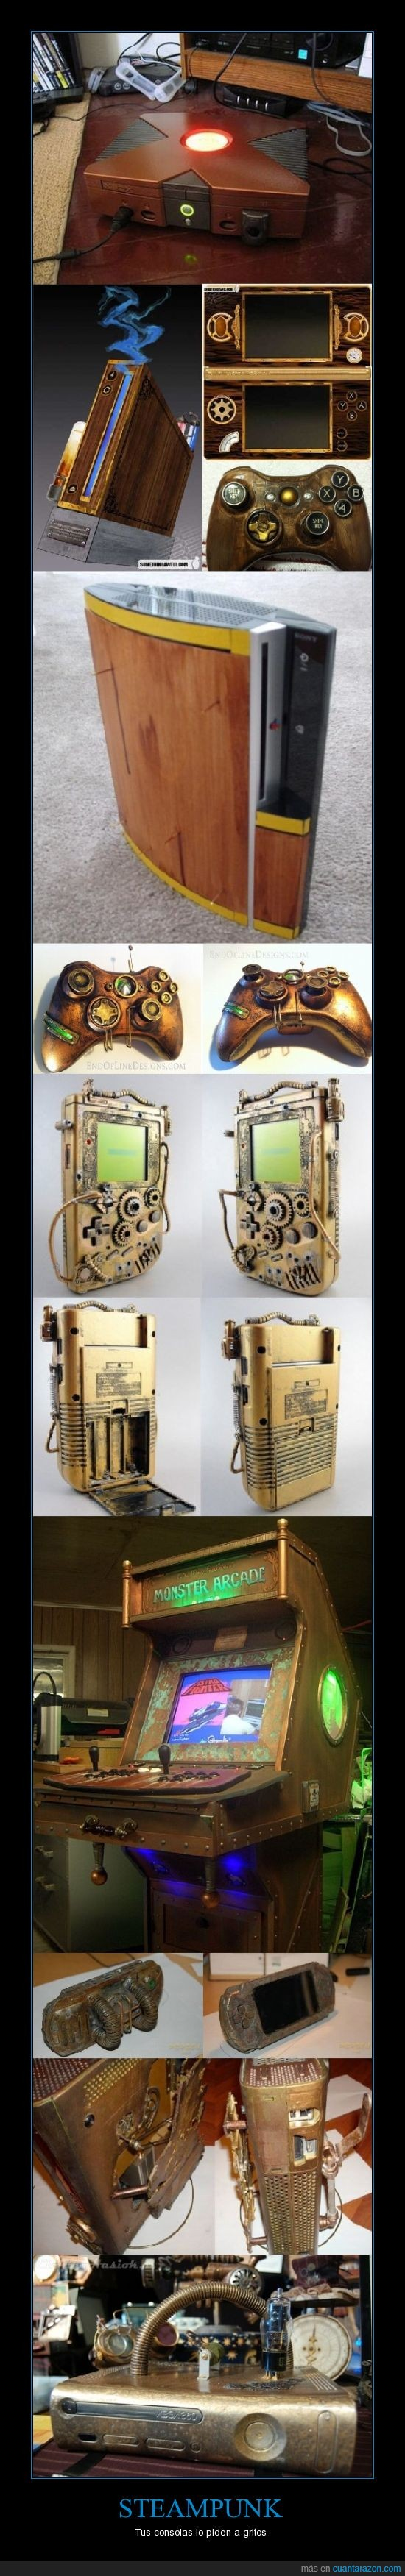 360,Arcade,consola,Game boy,pedir,Play staton,PSP,Steampunk,Wii,xbox